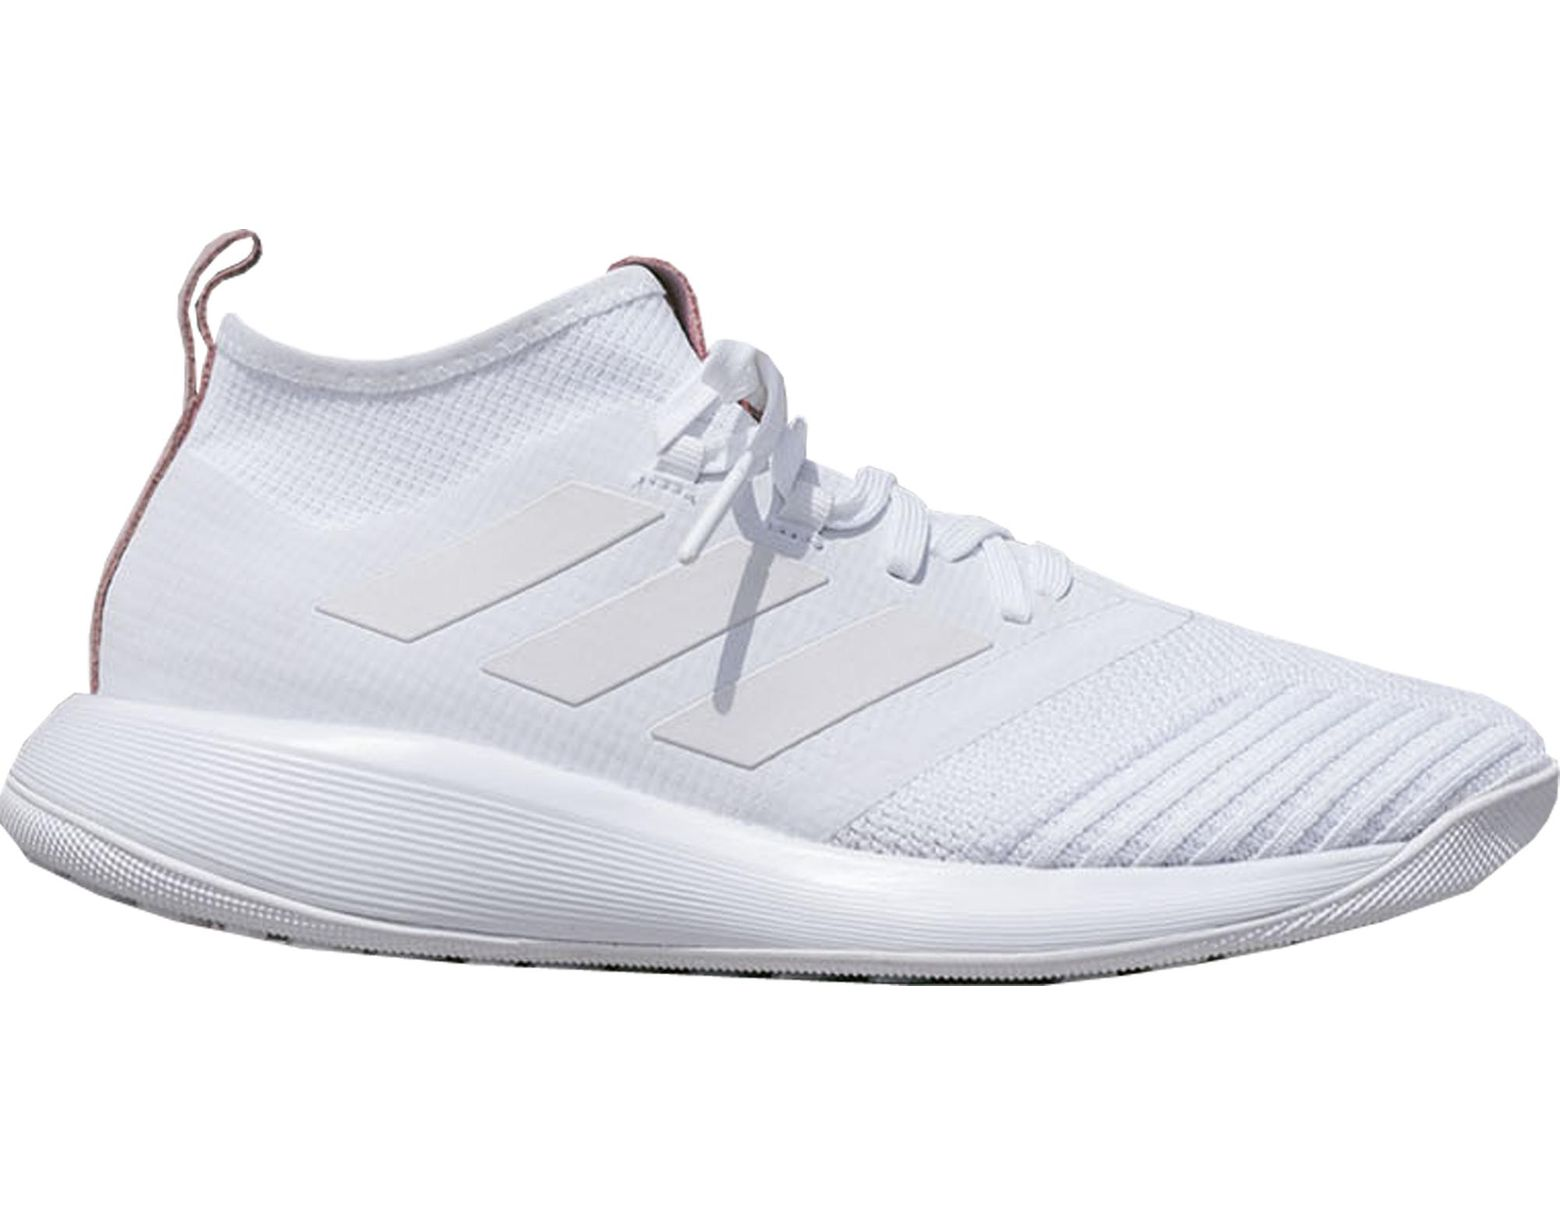 buy online 32b55 392f2 Men's White Ace Tango 17.1 Purecontrol Turf Sneaker Kith Flamingos